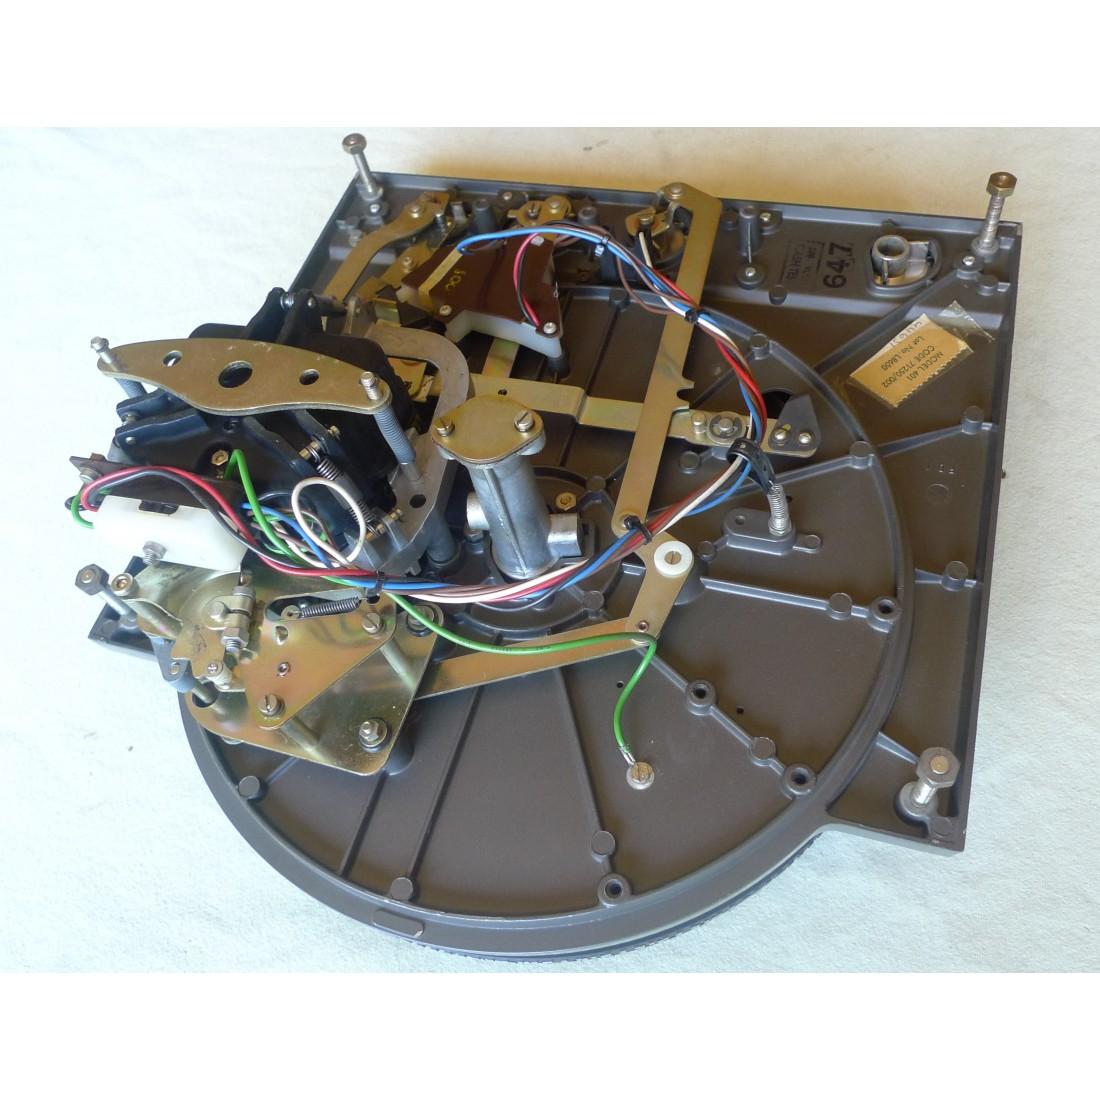 Vinyle Galet : Platine vinyle garrard vintage entrainement par galet